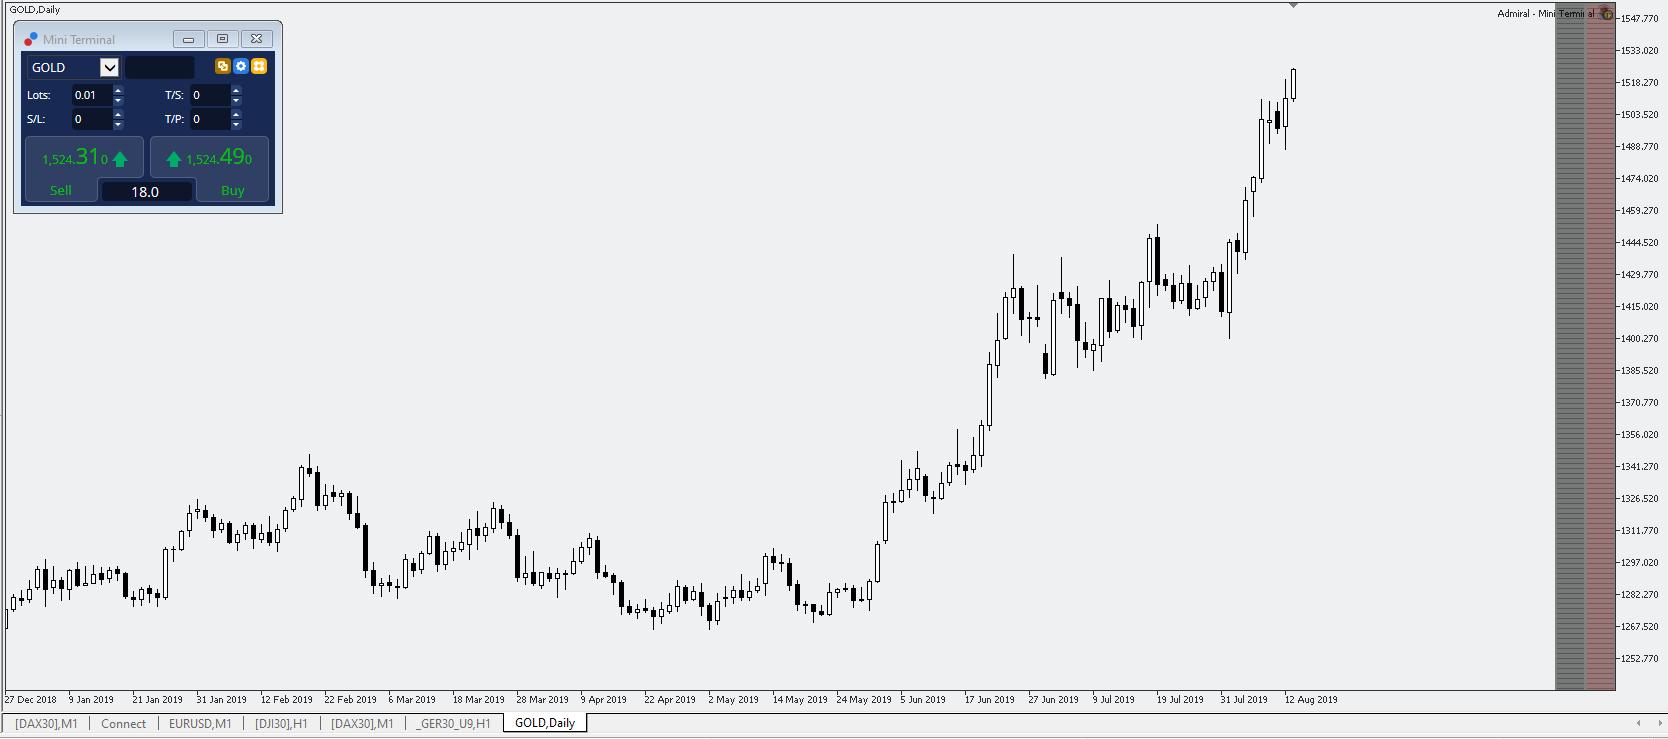 Gold-günstig-handeln-Long-oder-Short-Kommentar-Jens-Chrzanowski-GodmodeTrader.de-2